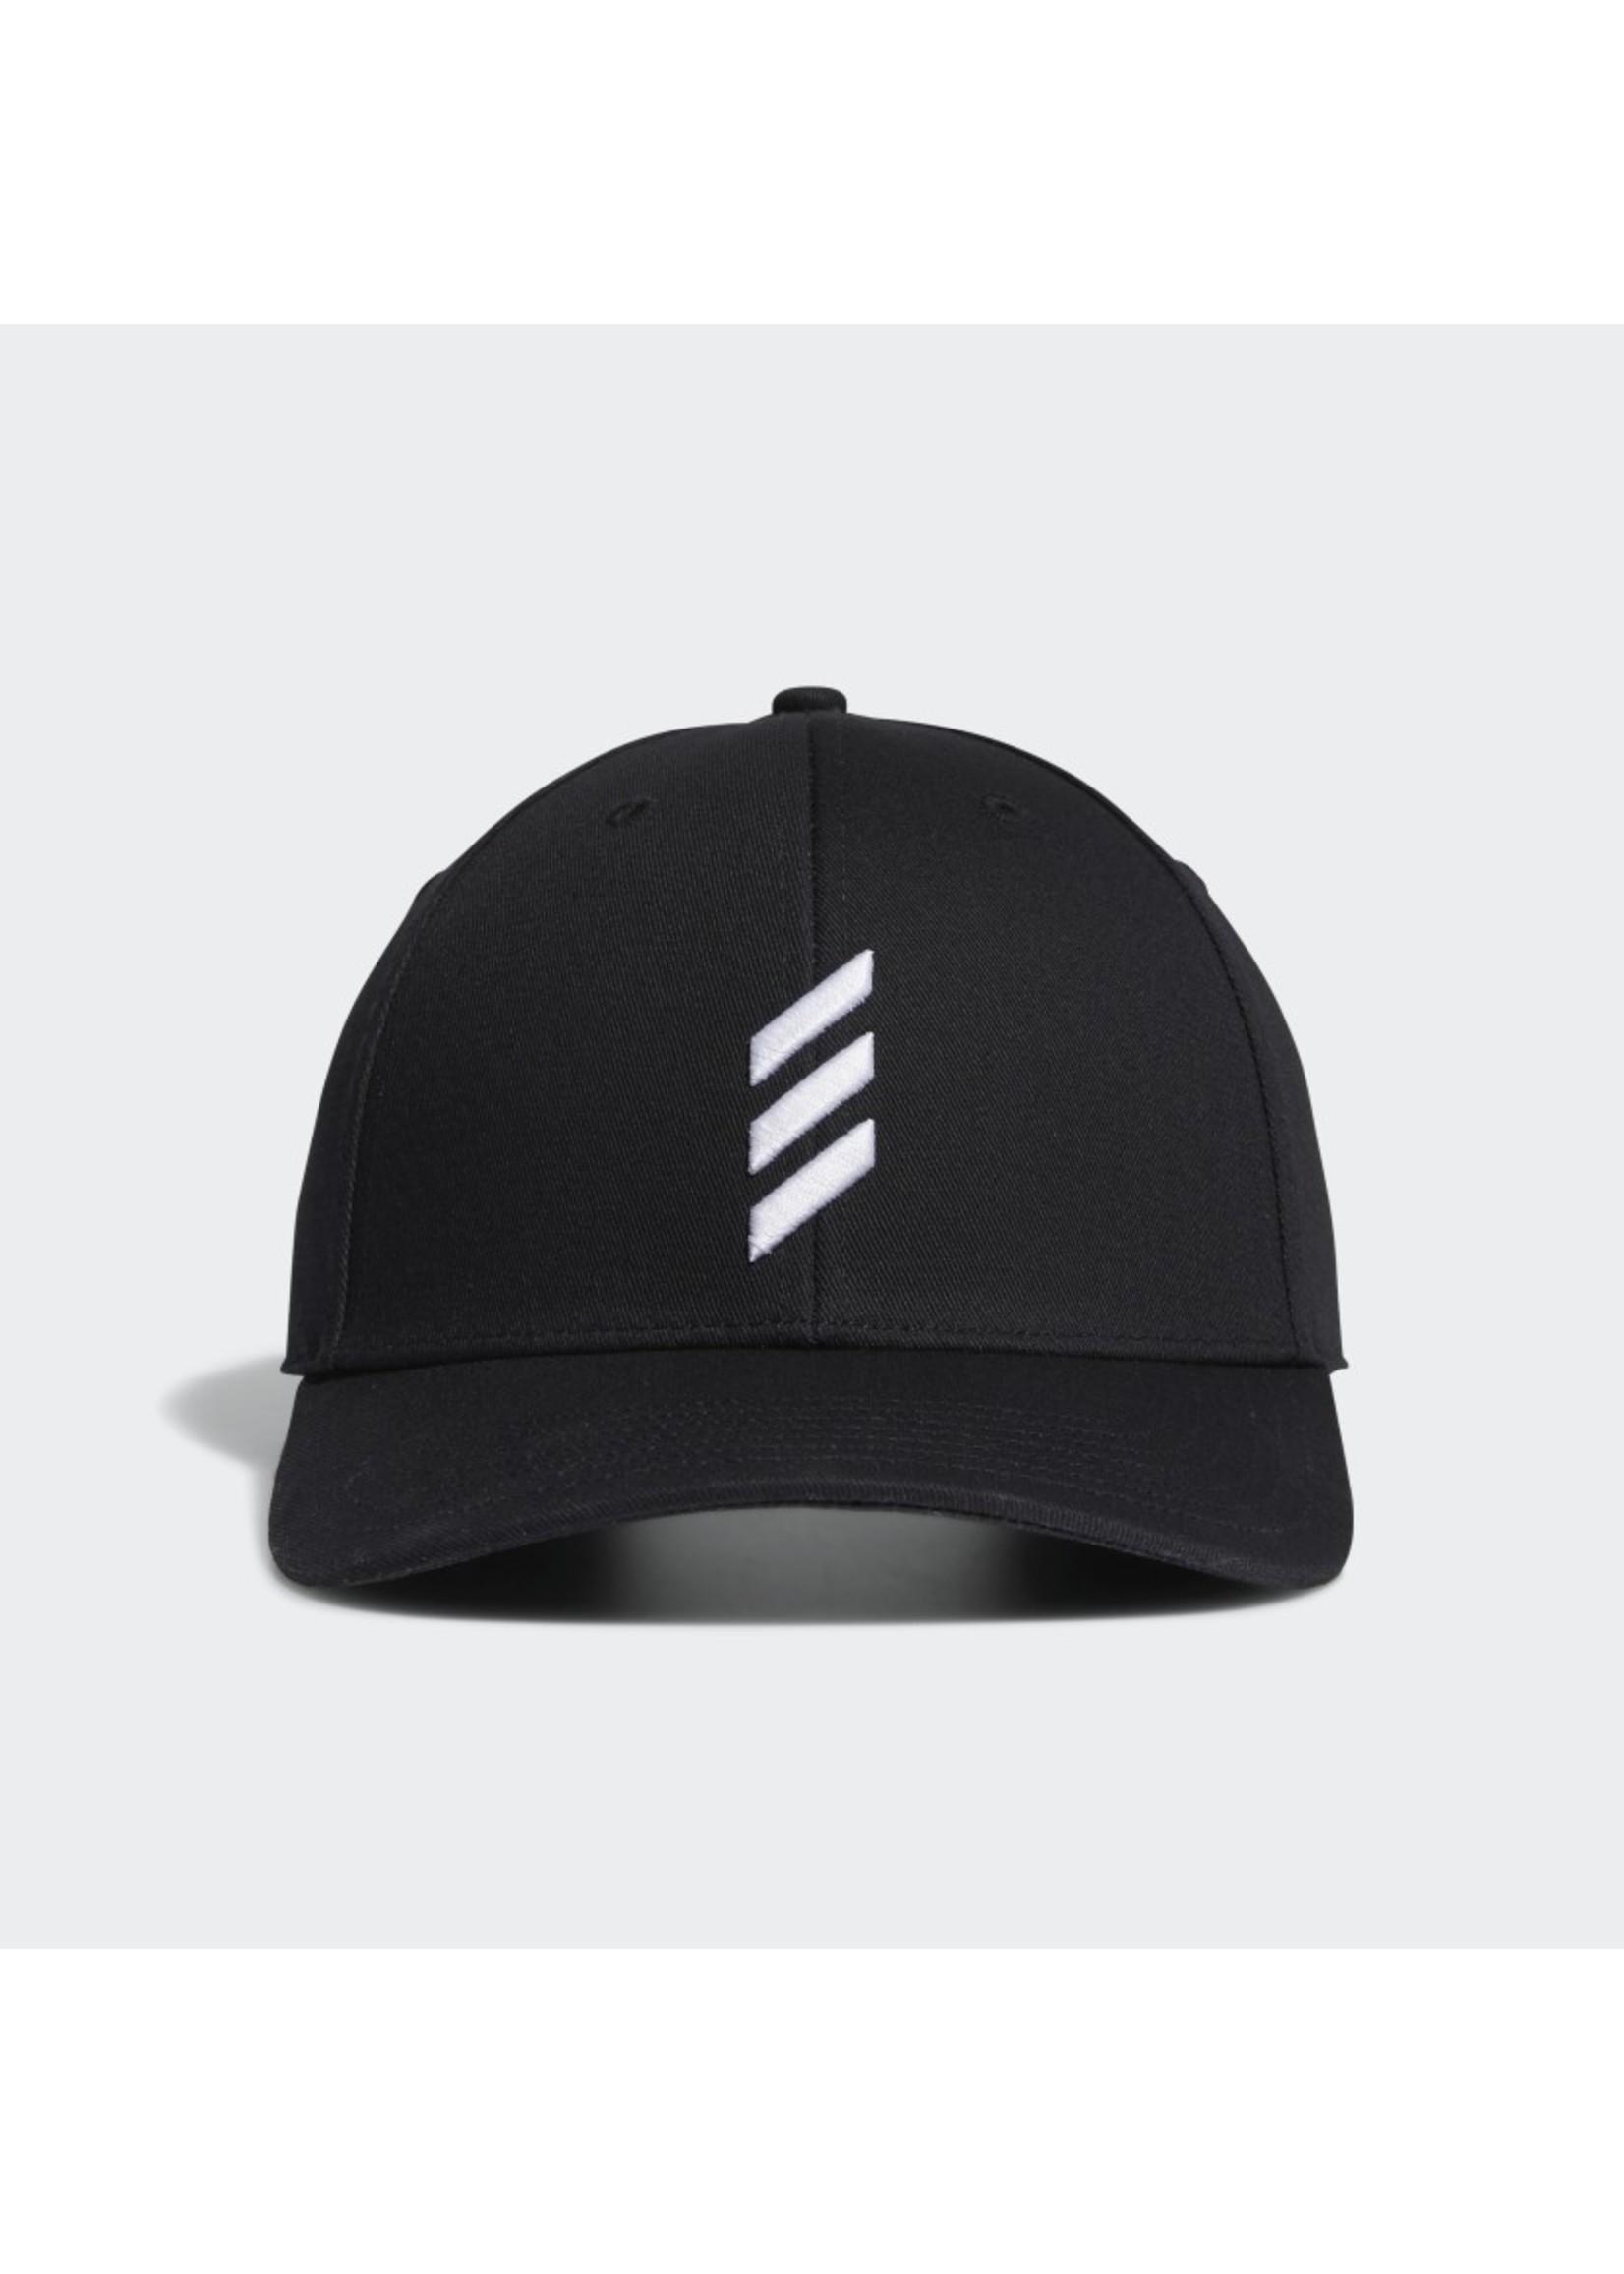 Adidas Adidas Bold Stripe Cap (2020), Black